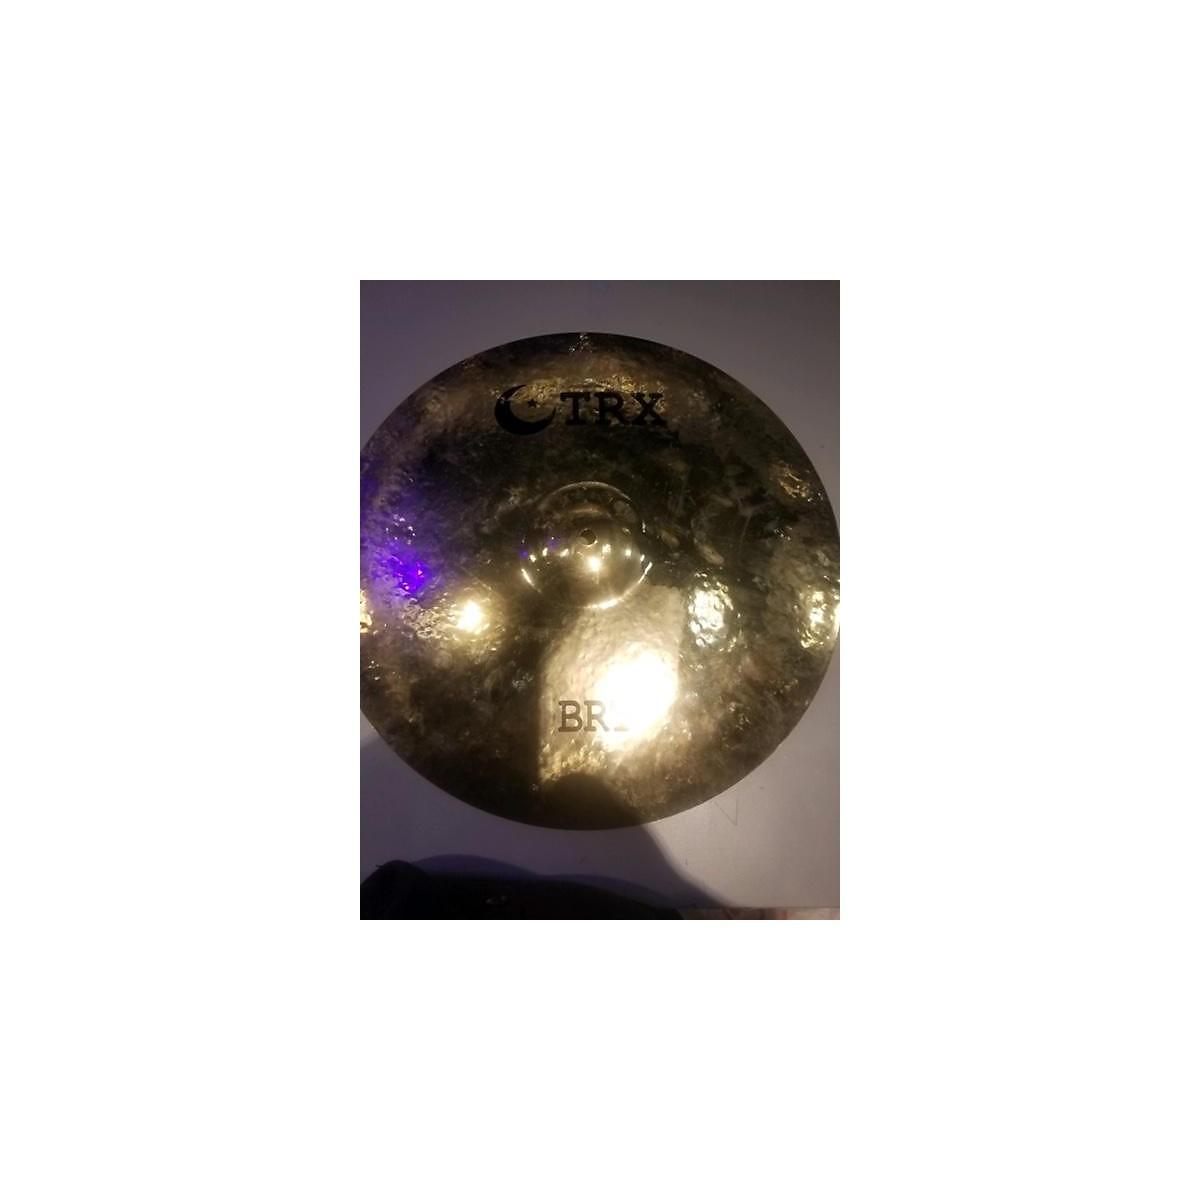 TRX 18in Crash Bright Cymbal